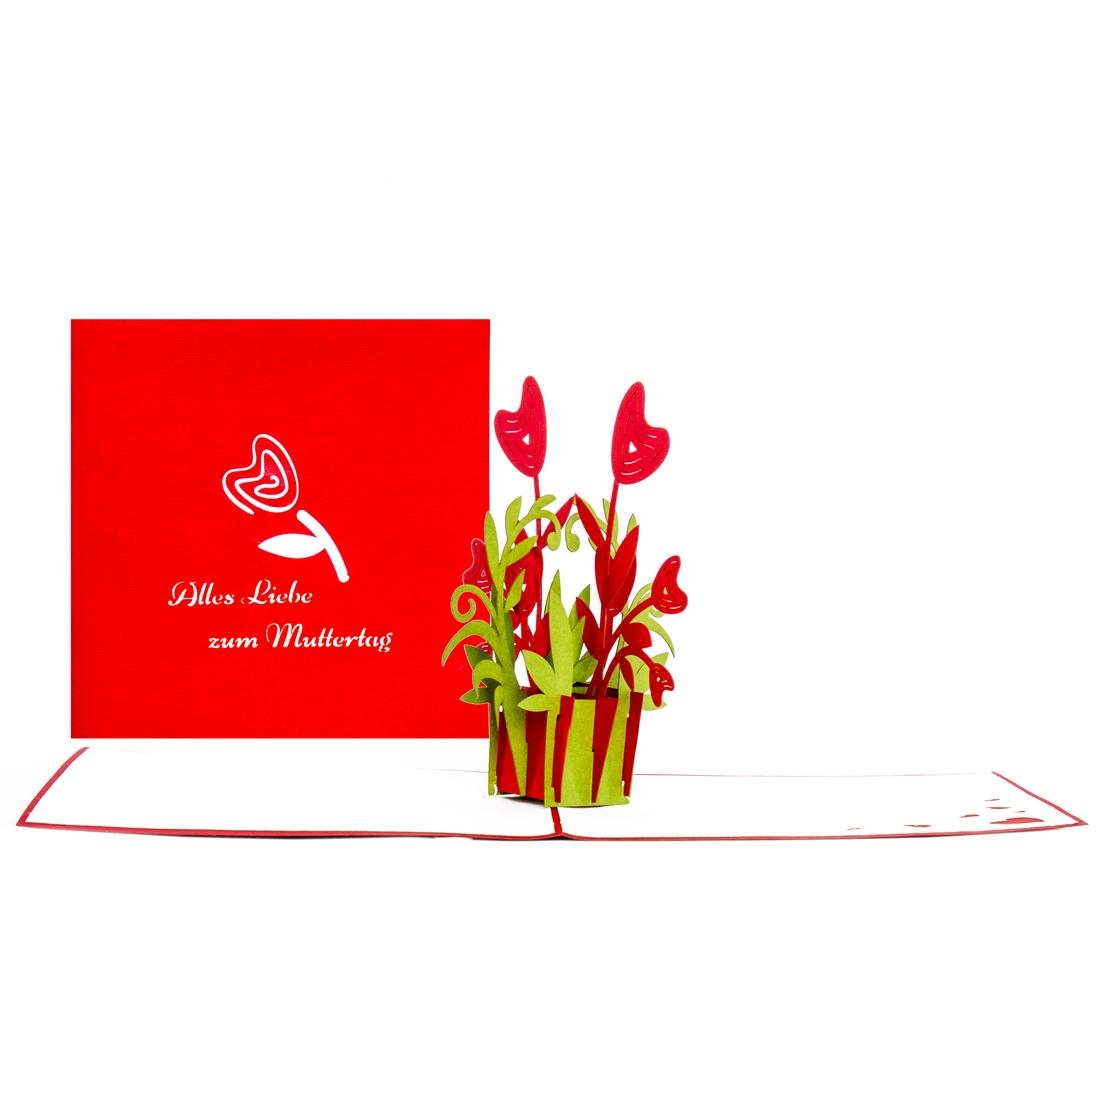 "Muttertagskarte ""Blumenherzen"" - Pop Up Karte zum Muttertag"